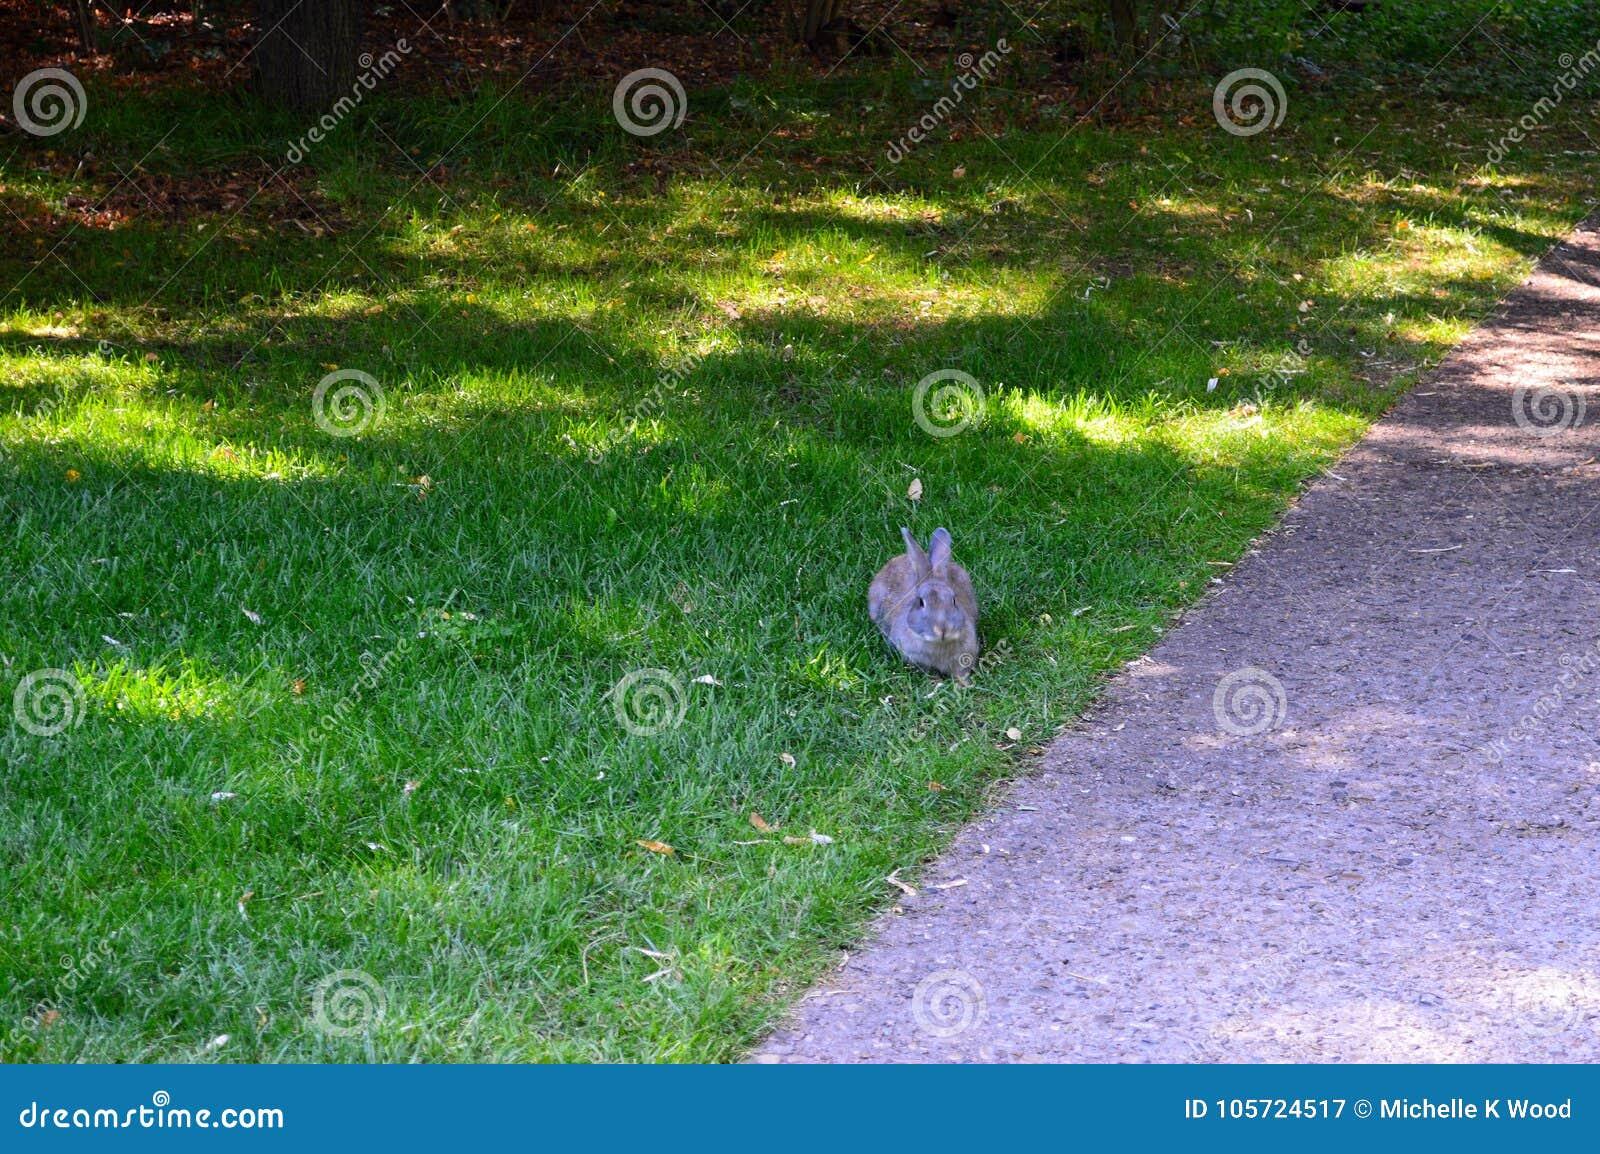 Rabbit on the path at Alberston`s Park Boise Idaho